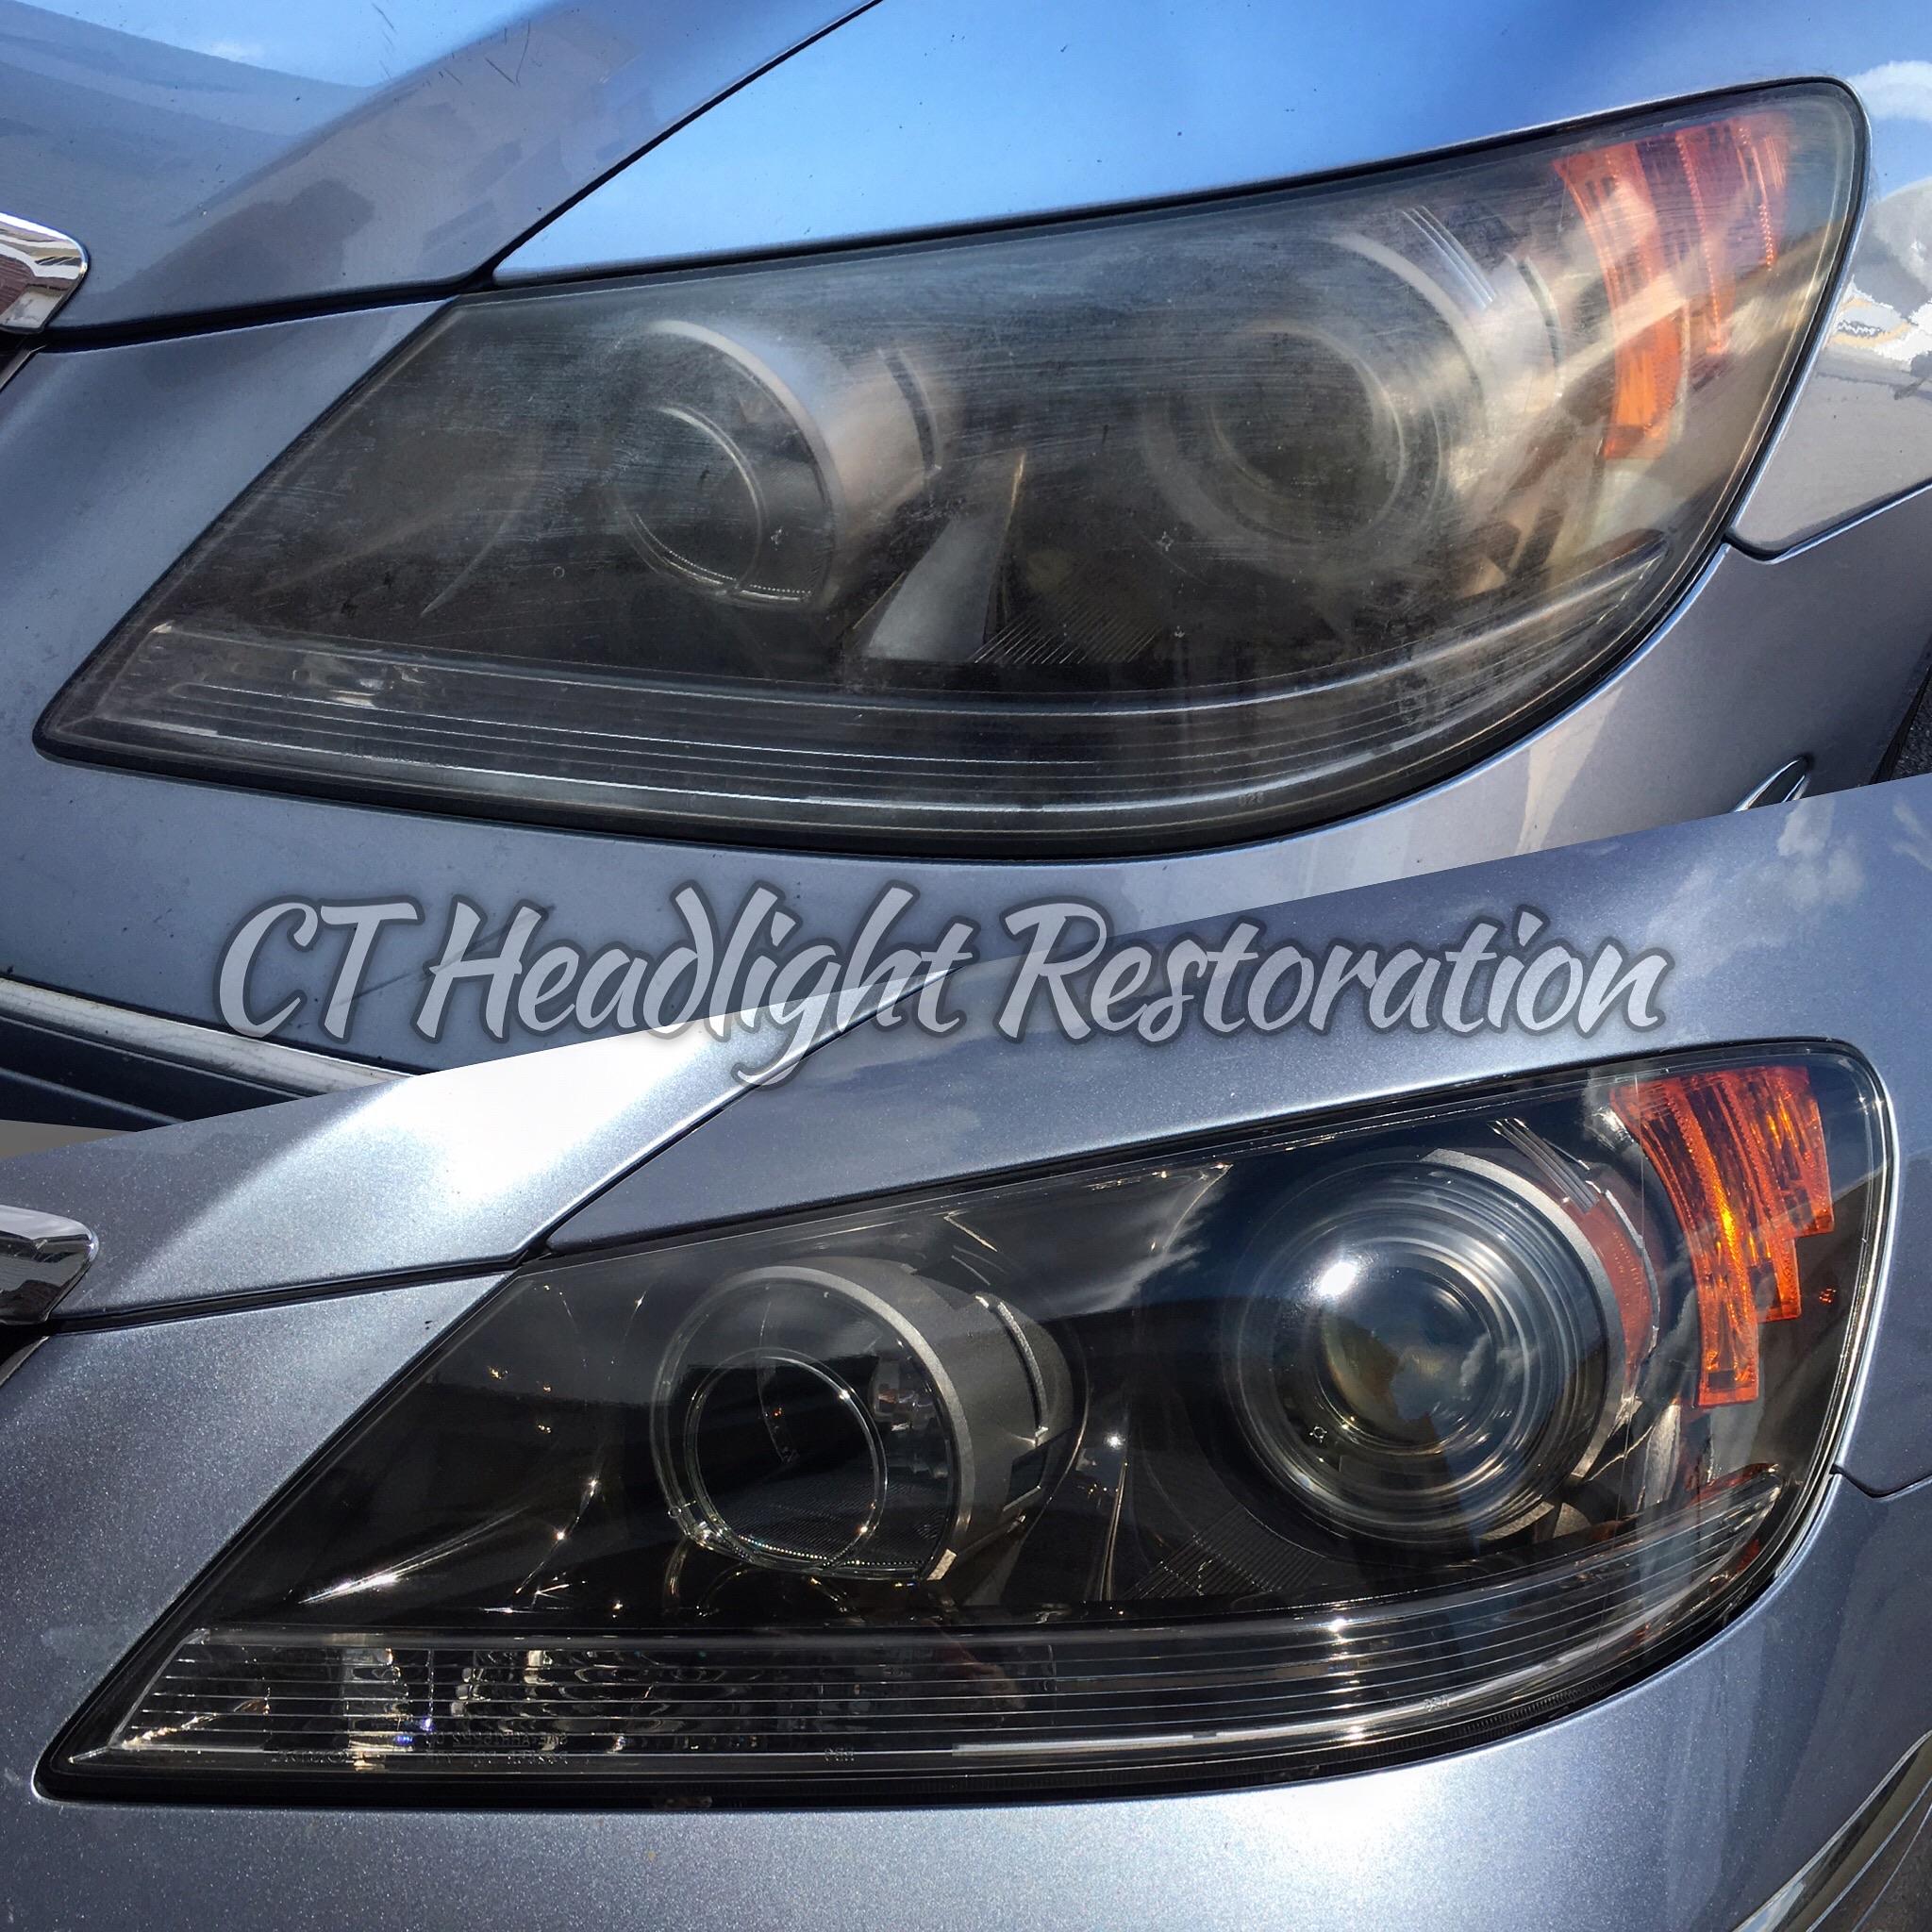 Acura RL CT Headlight Retoration.jpg